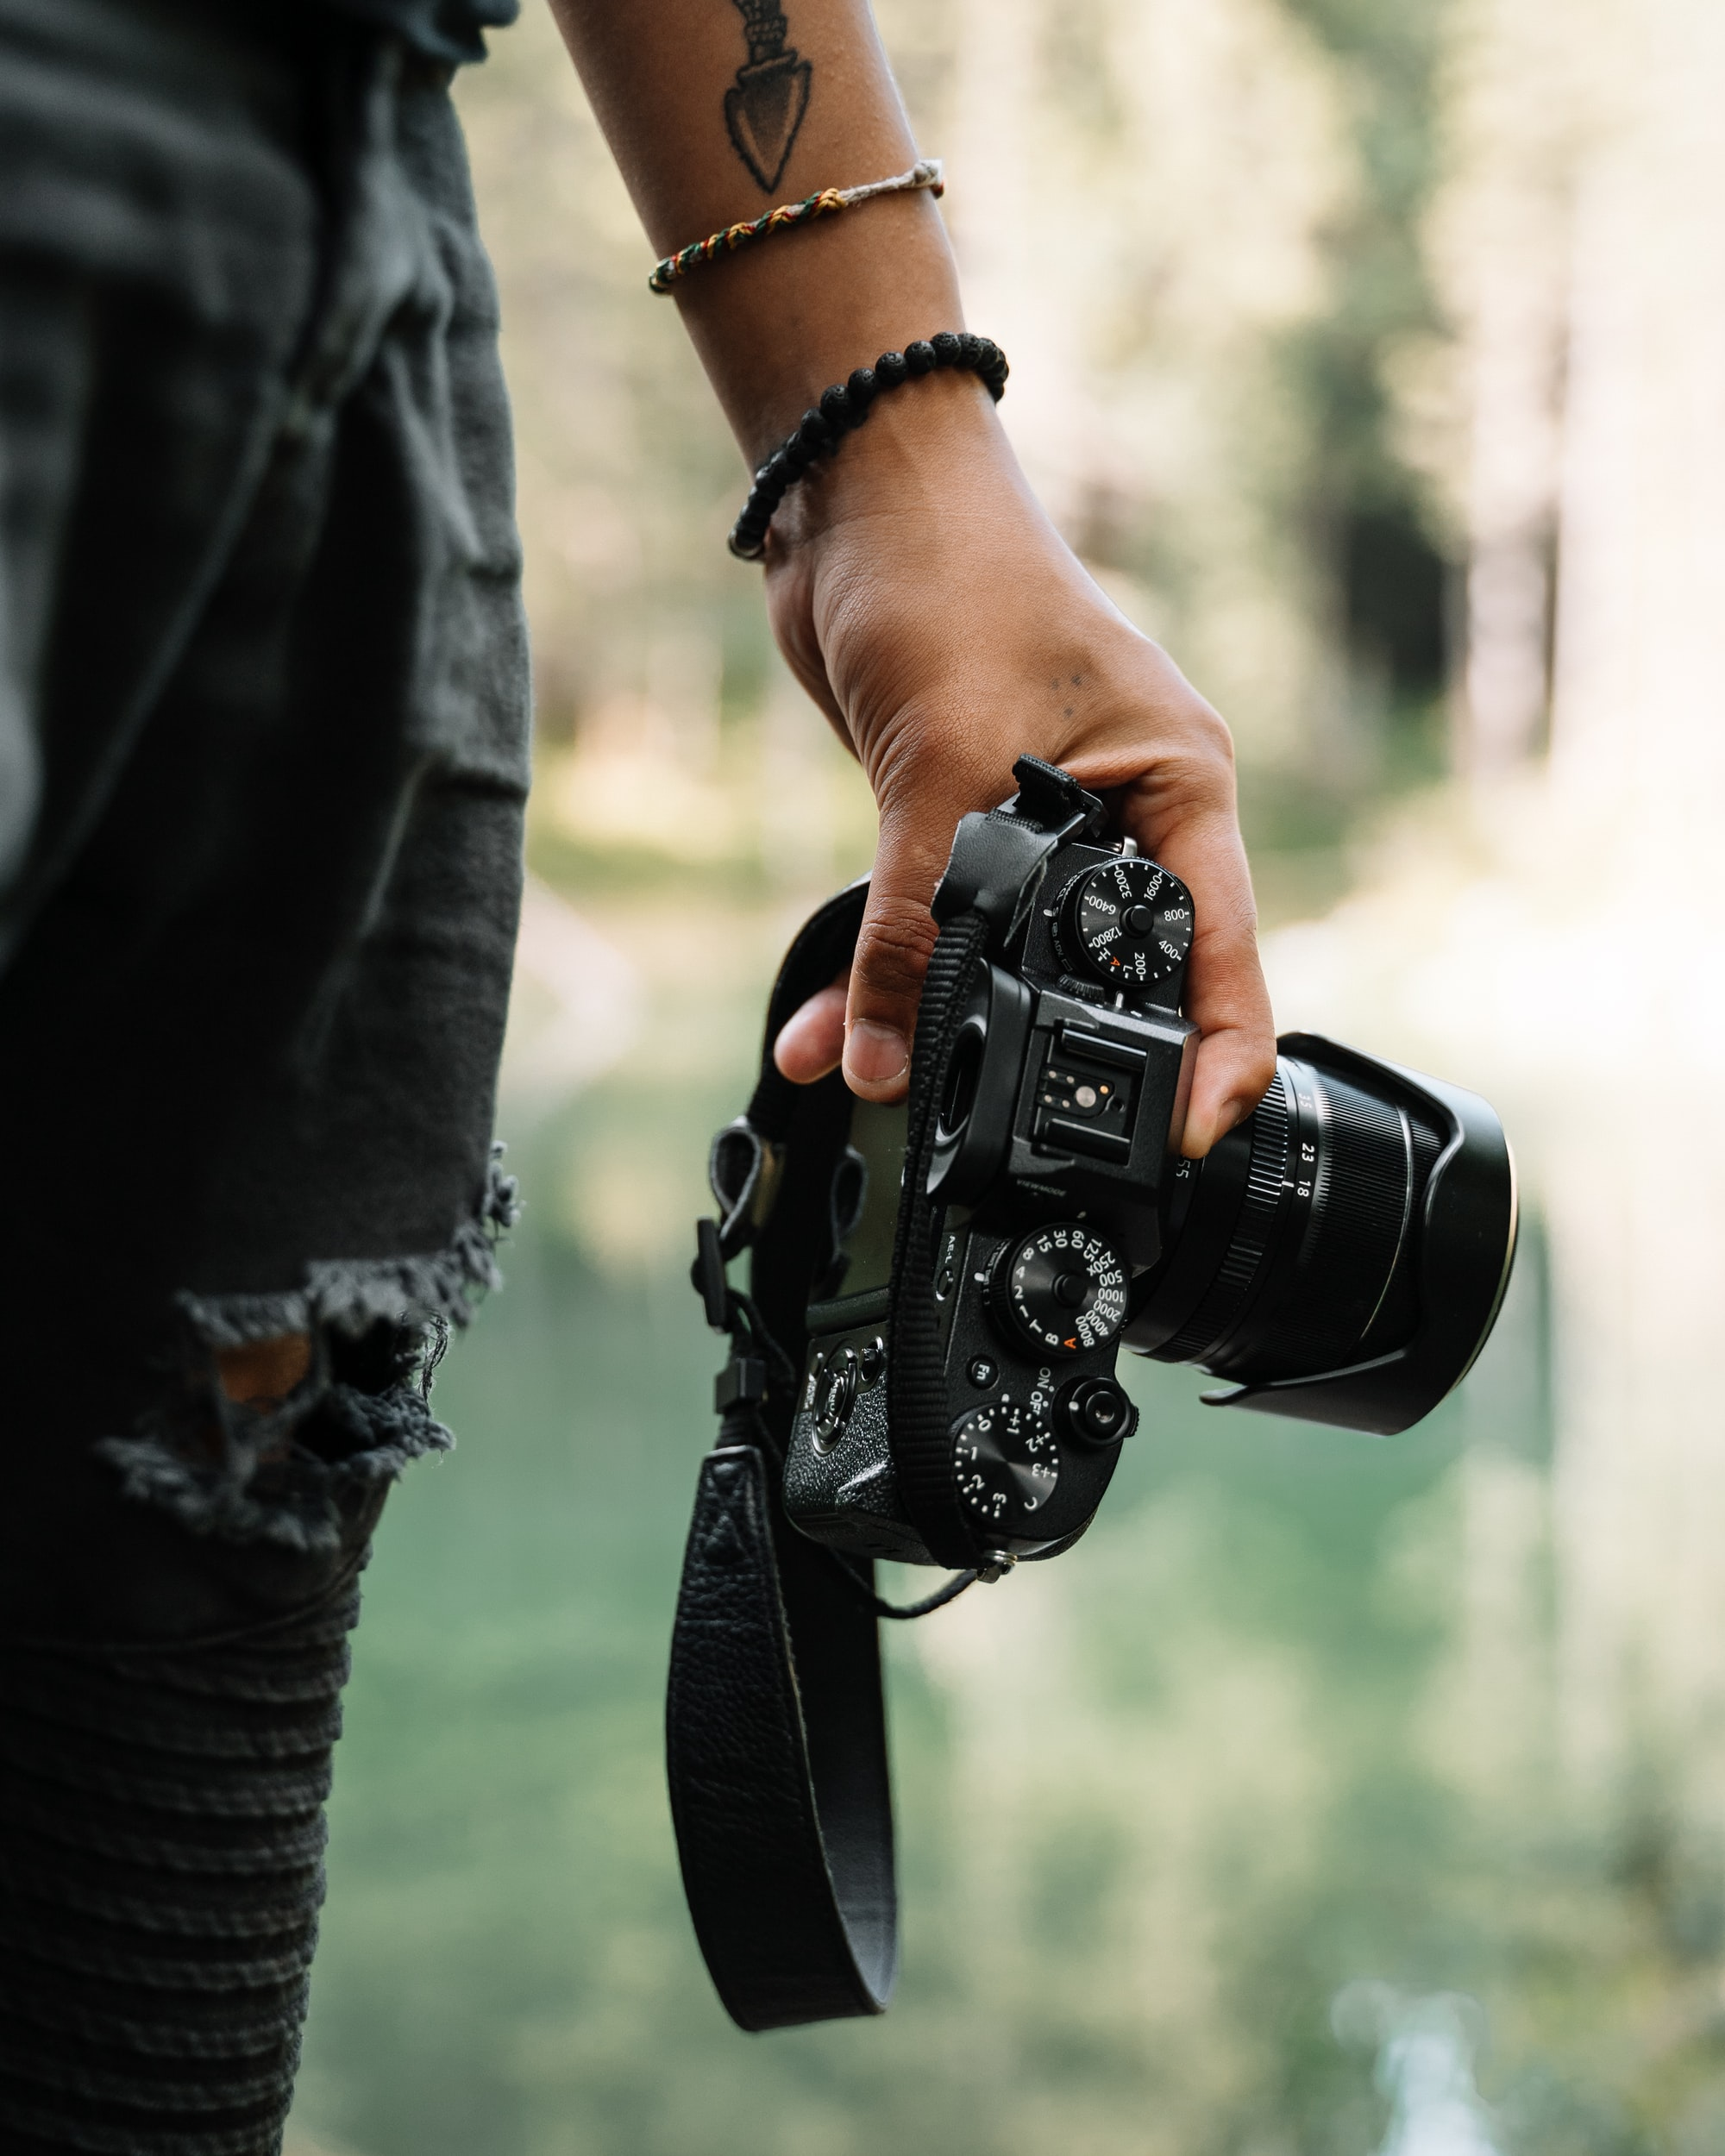 Holding a film Camera